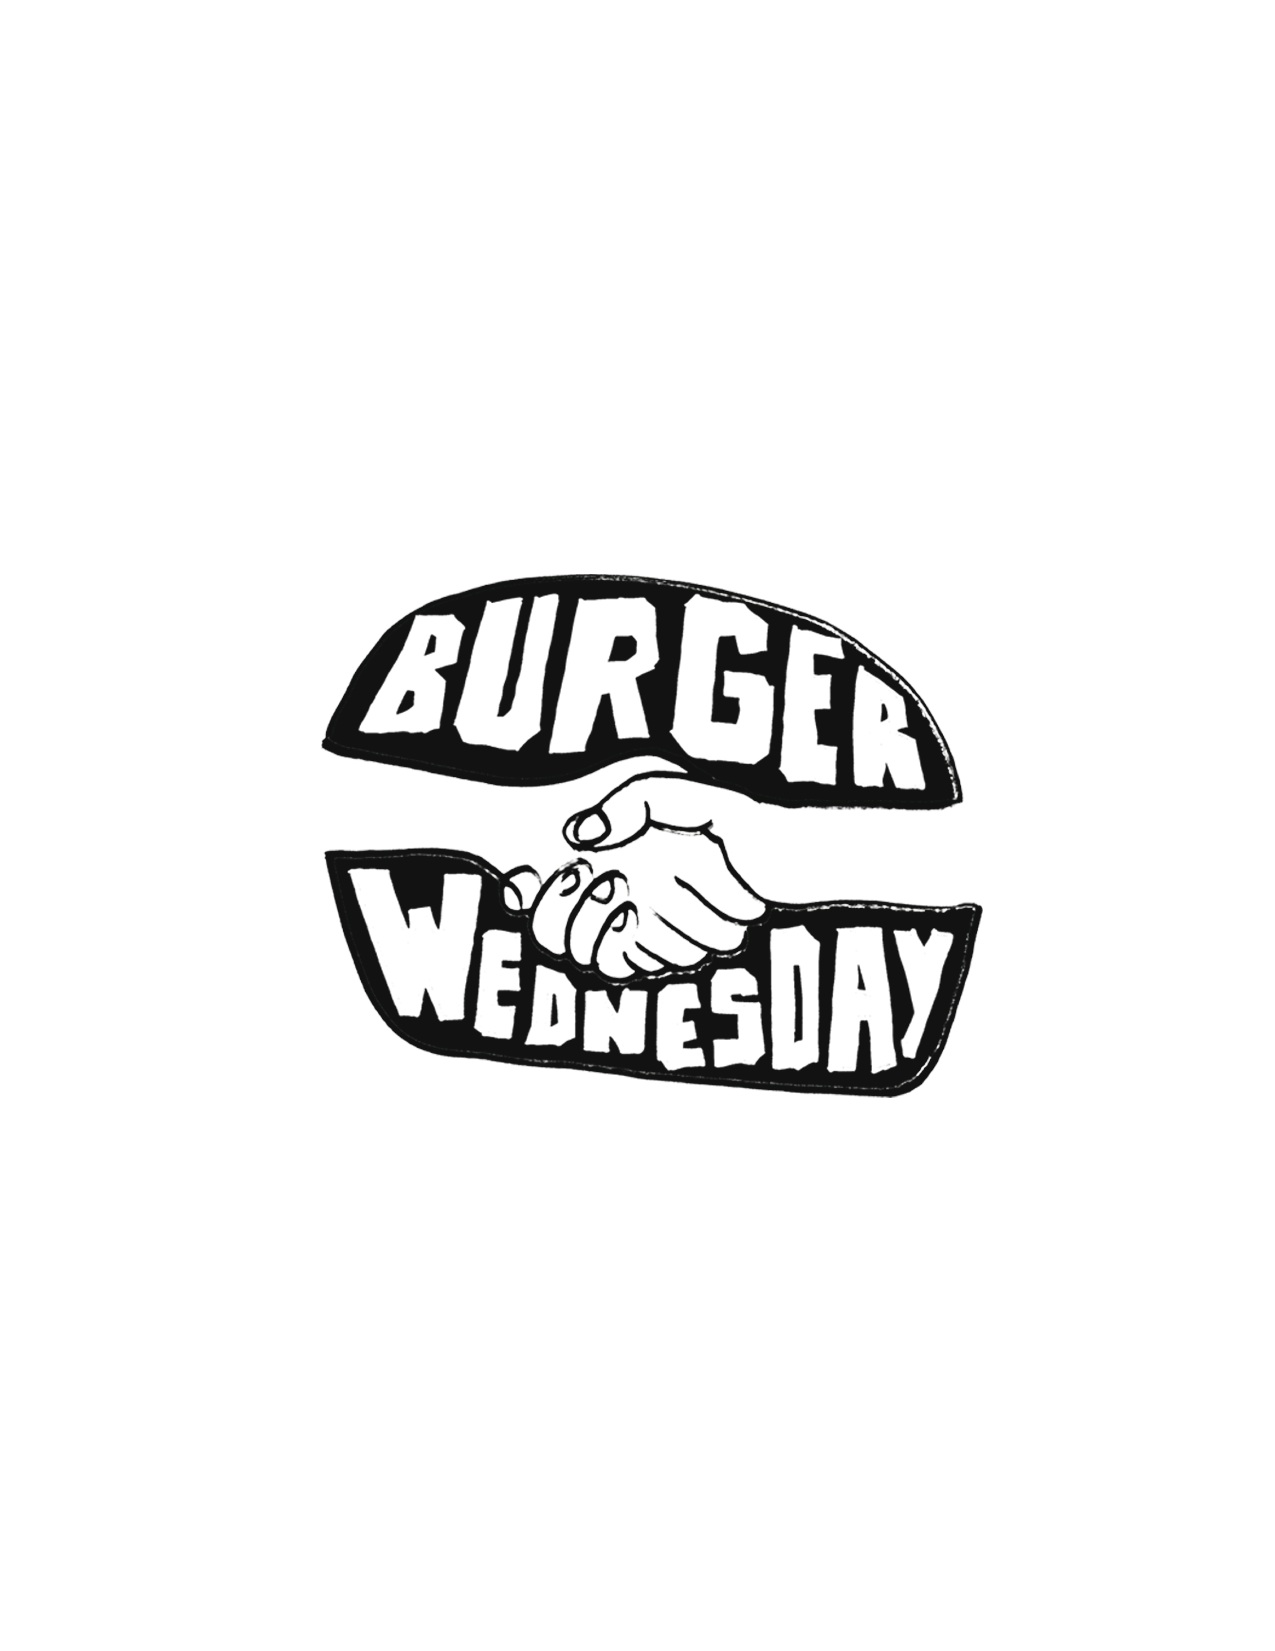 burger wednesday logo.jpg